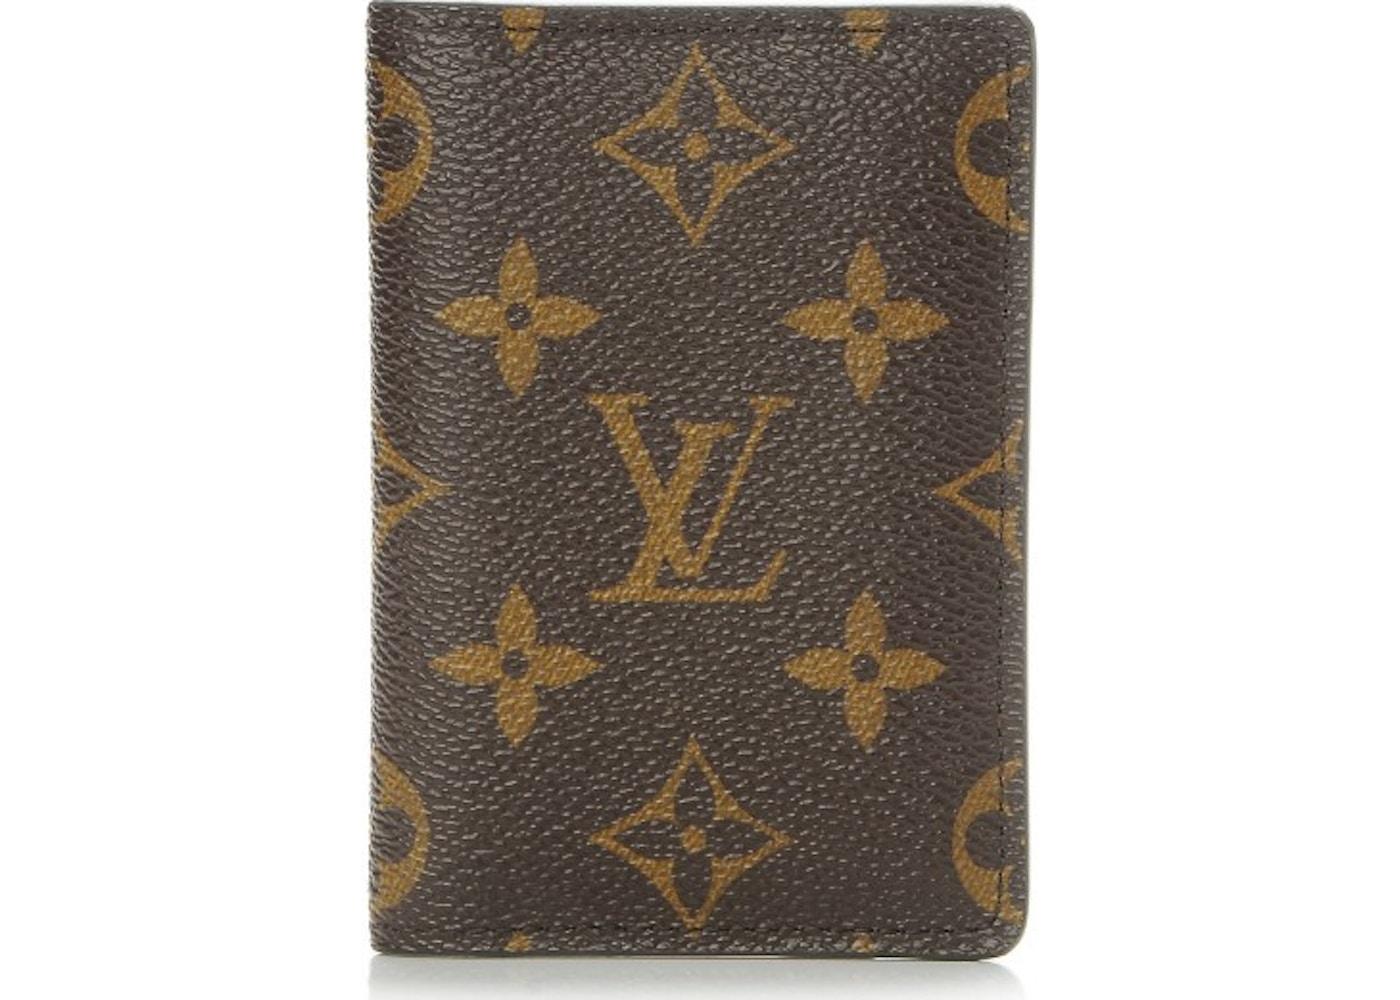 louis vuitton card holder pocket organizer monogram brown - Monogram Card Holder